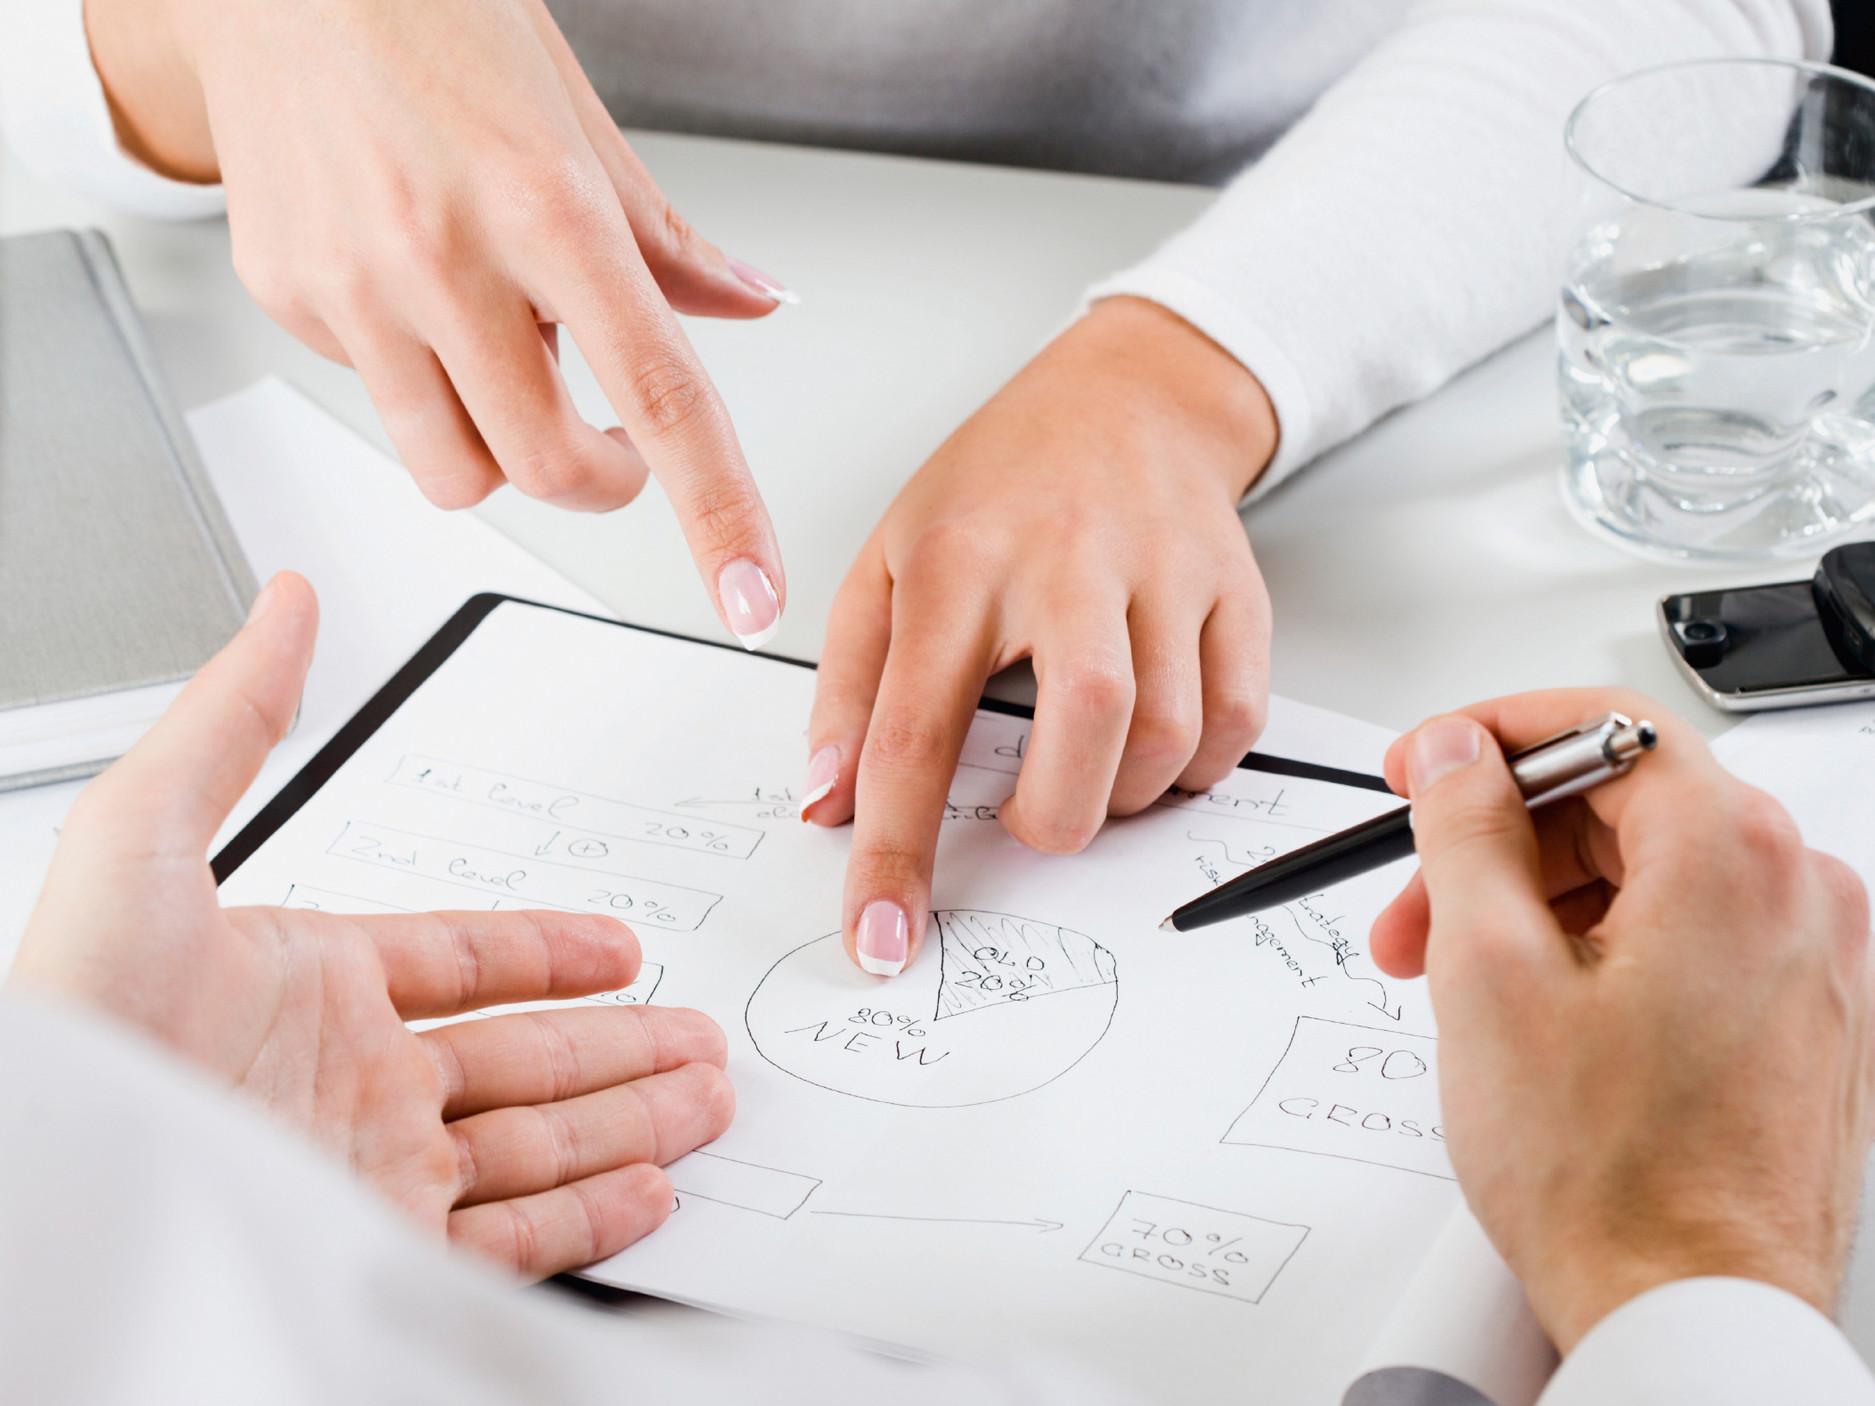 Online accounting courses Ireland,ACCA,CIMA training